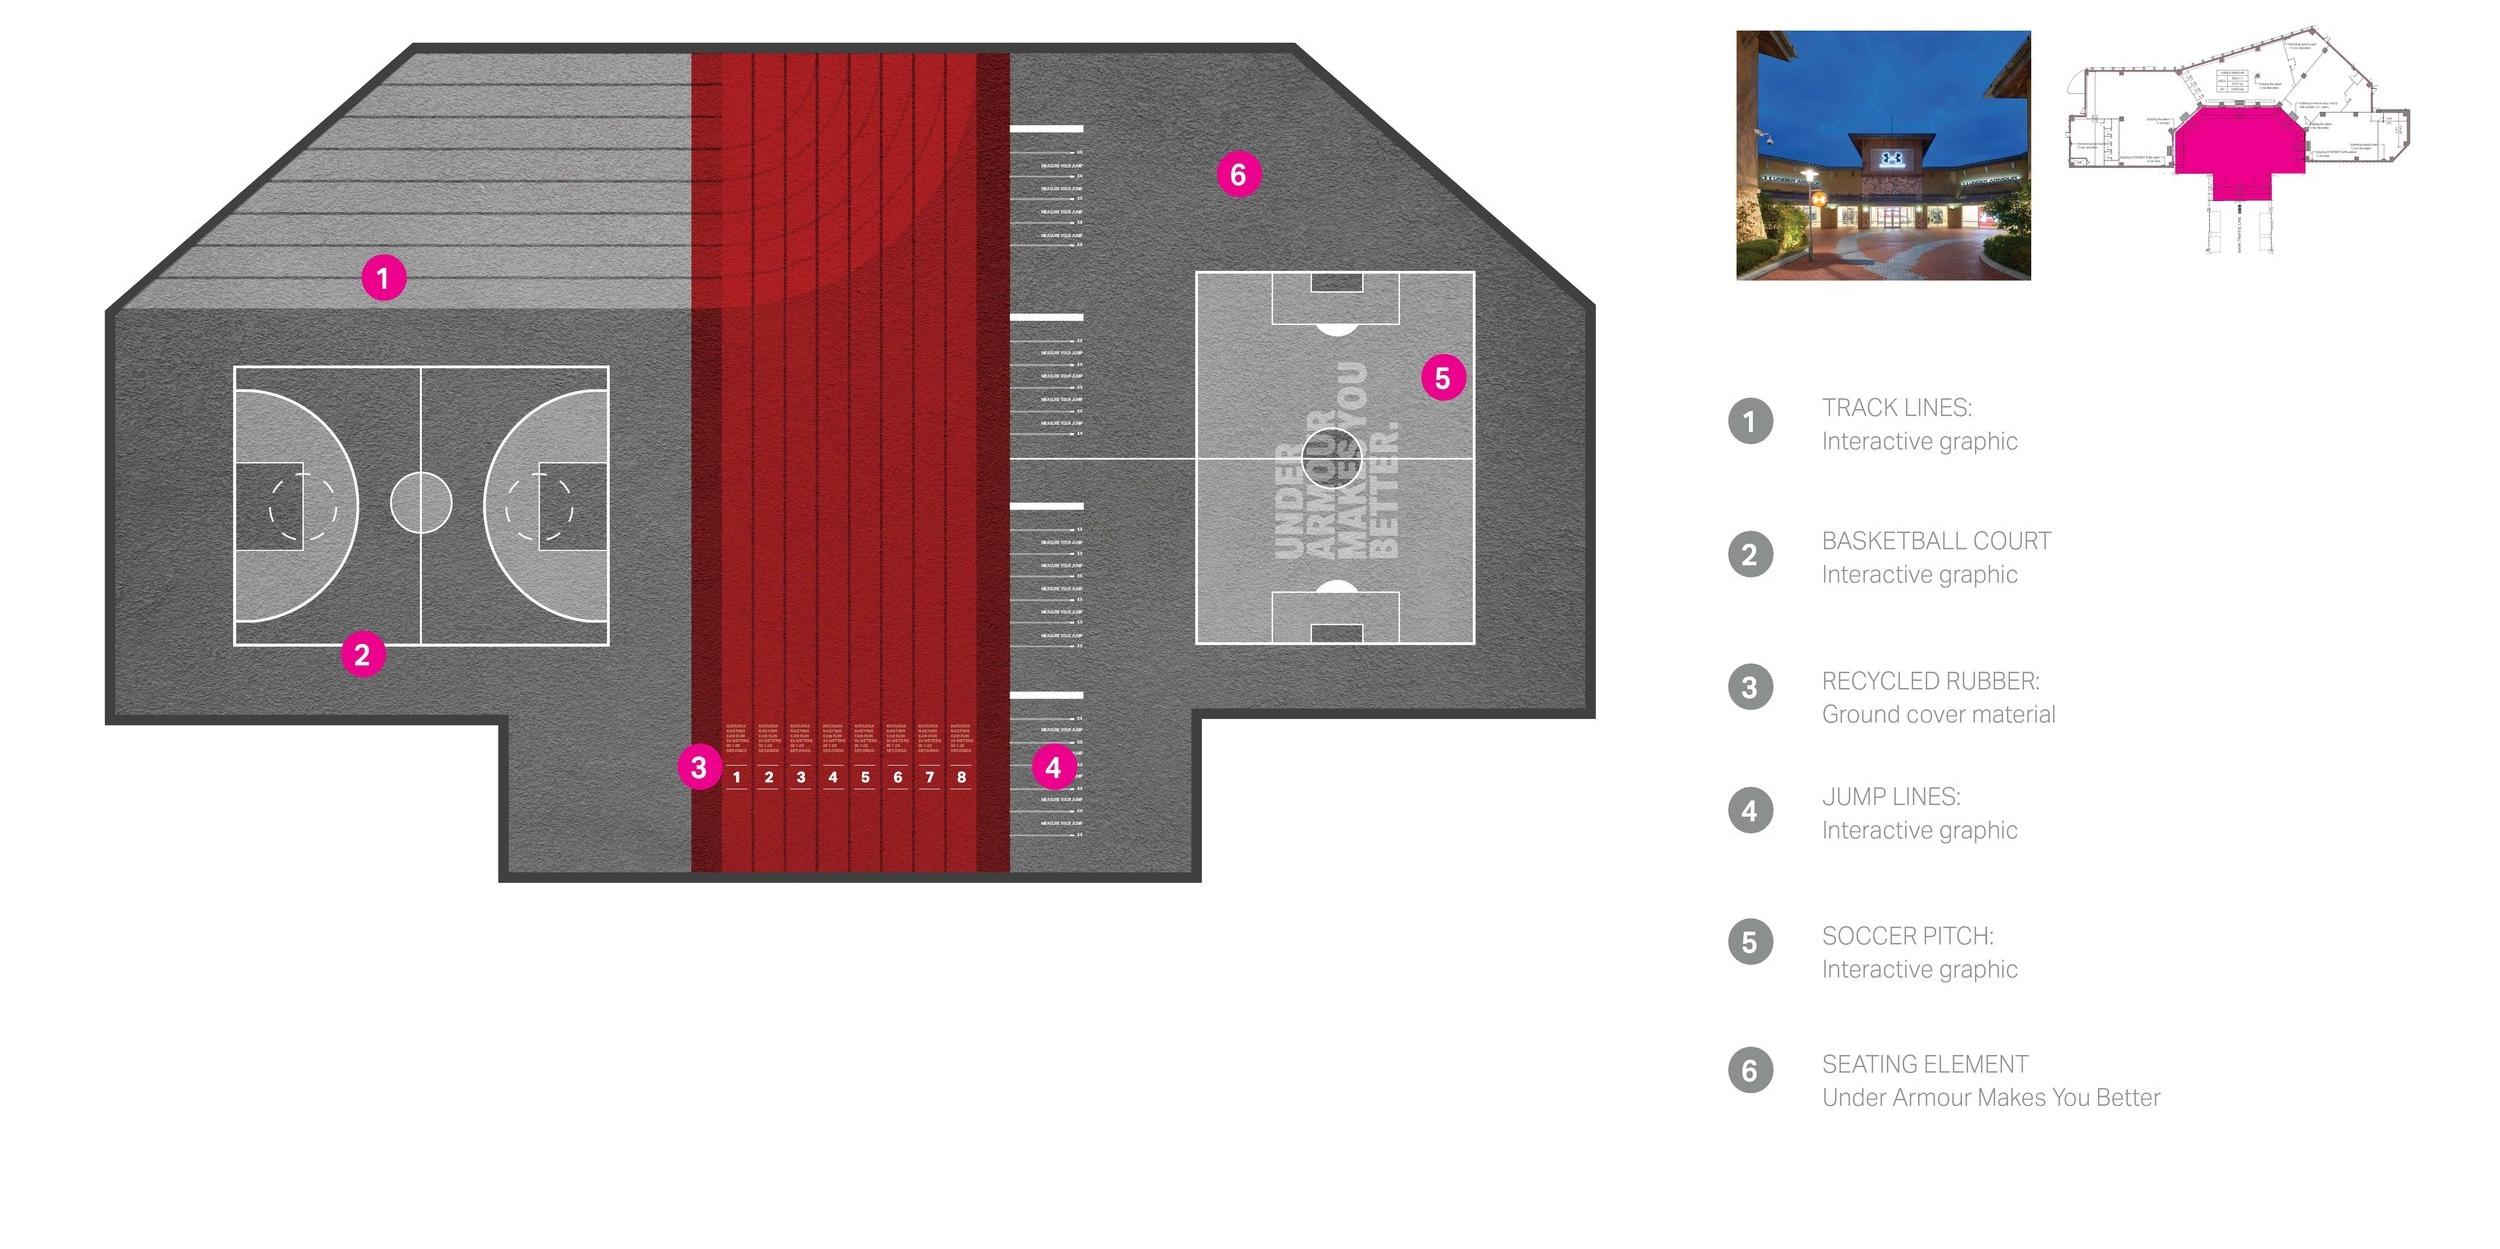 UA_BH_SKorea_OutdoorBranding_CO_Presentation_180404_Page_21.jpg